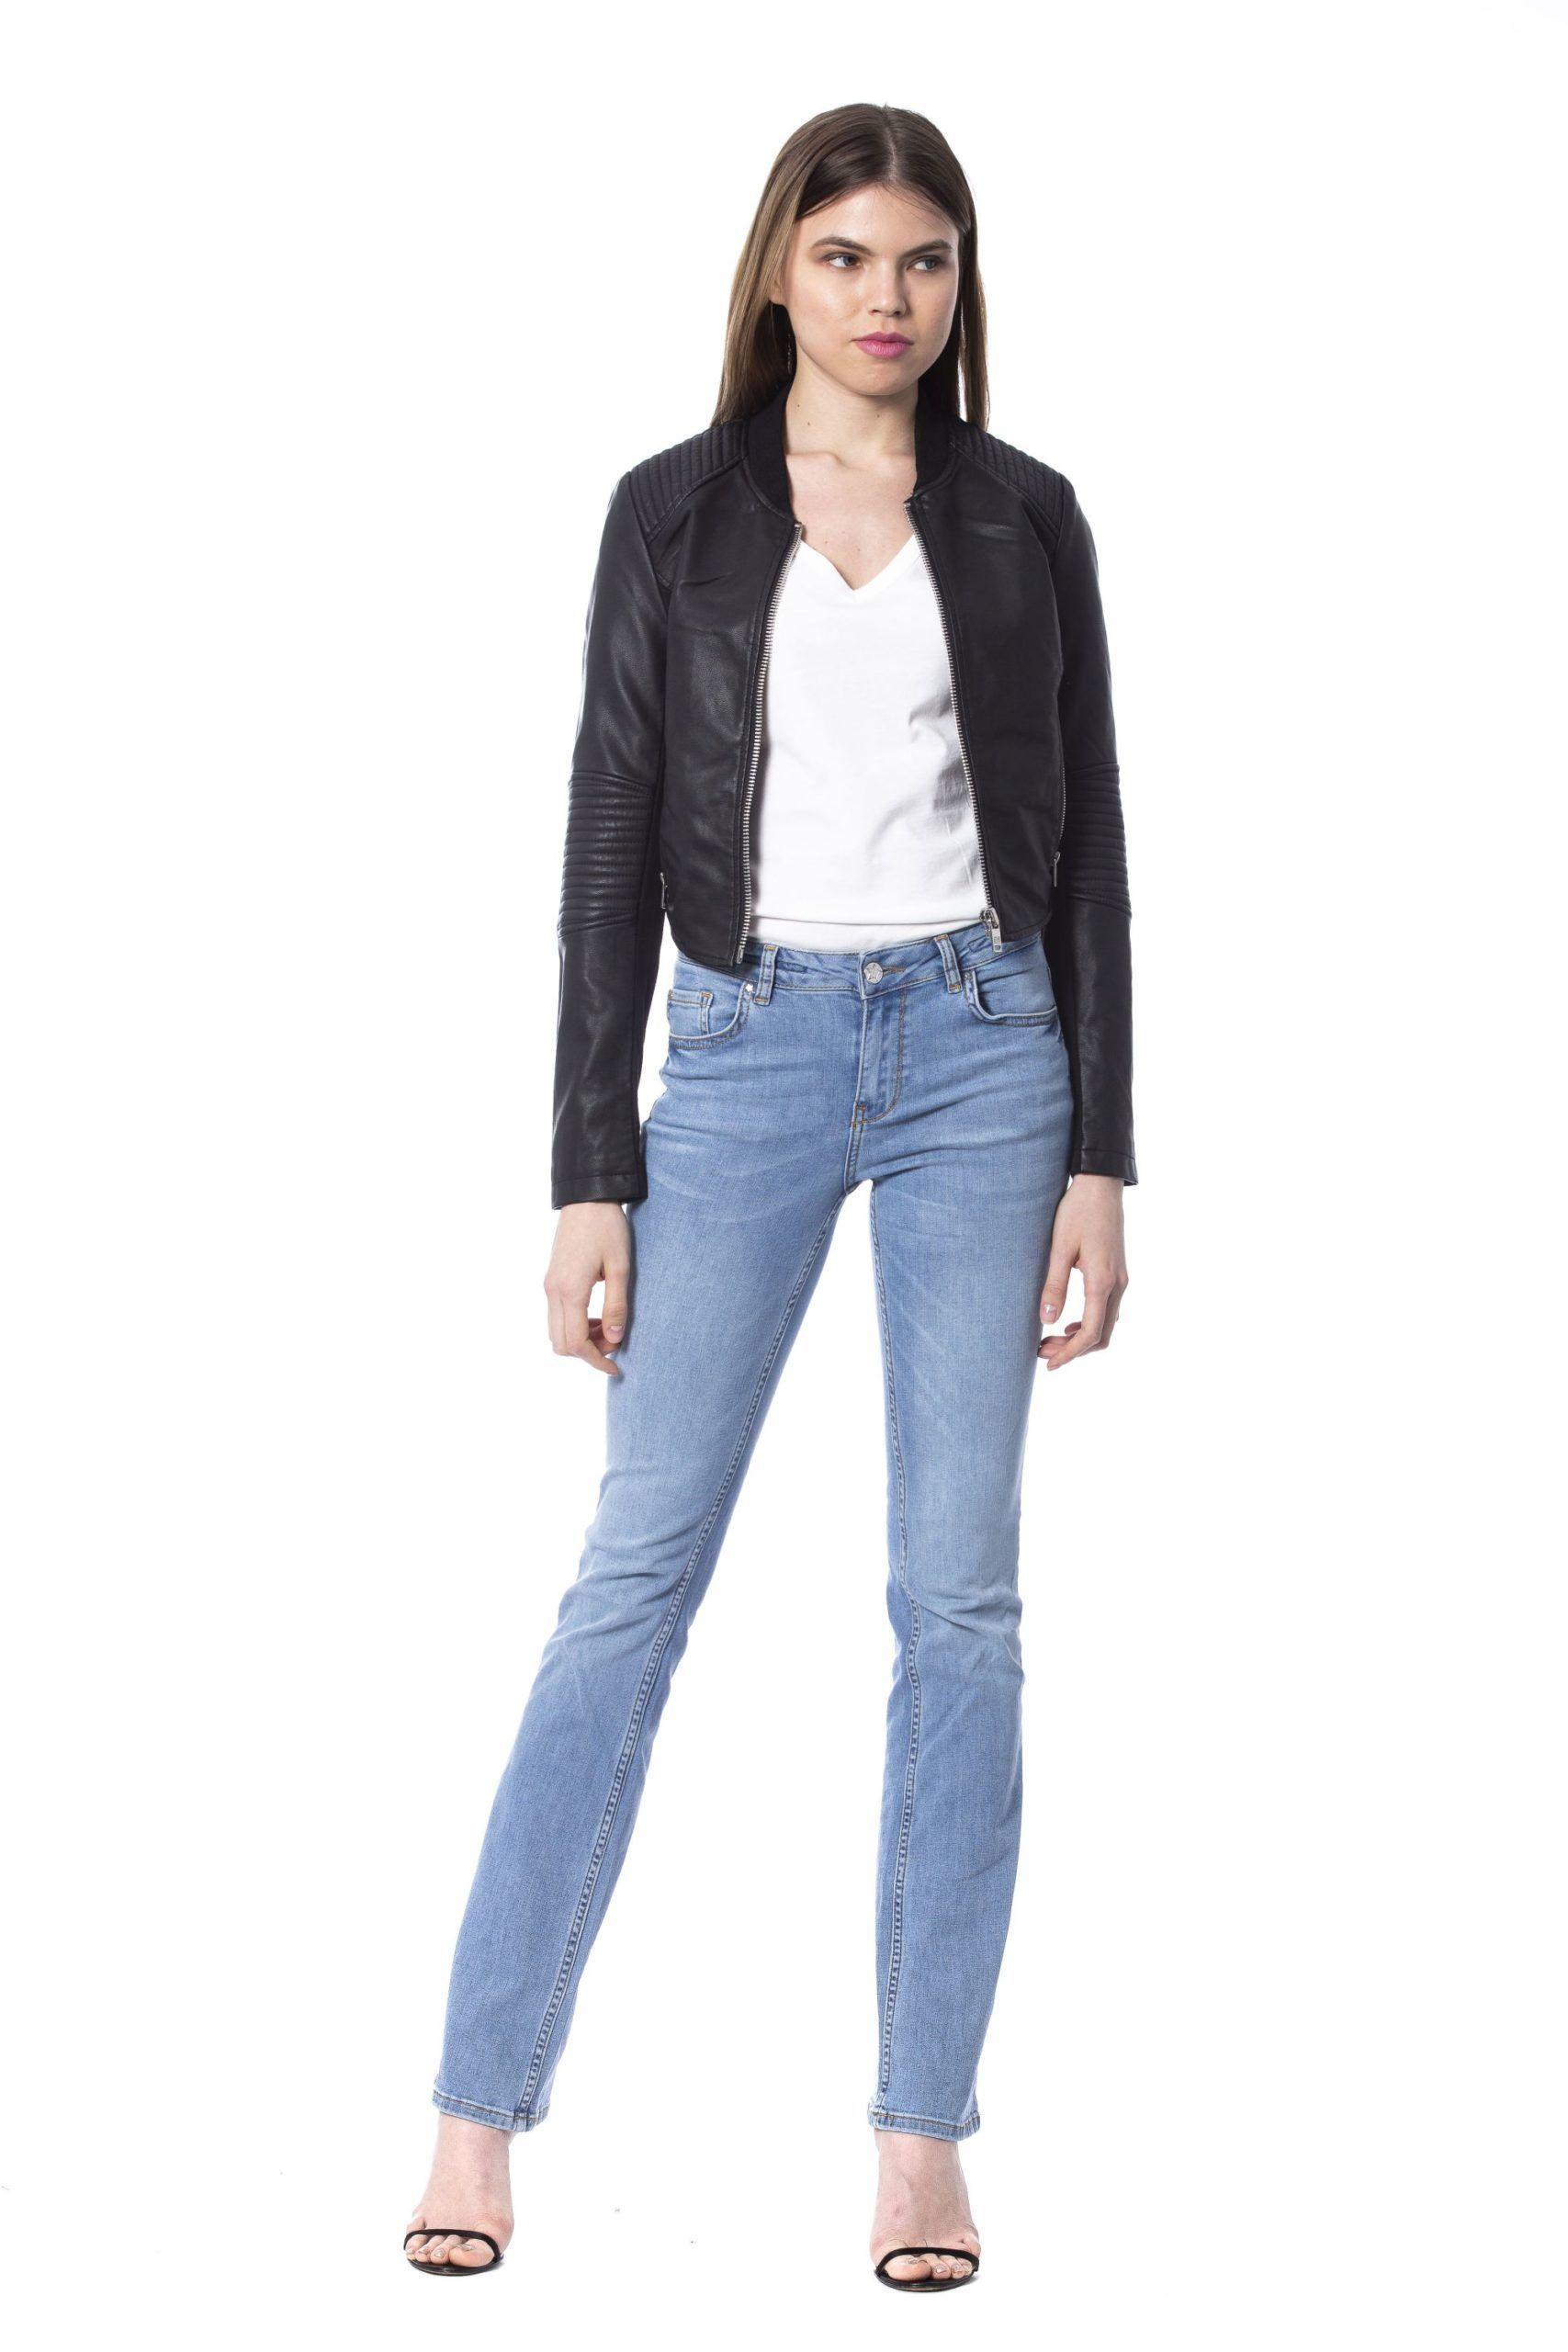 Silvian Heach Black Jackets & Coat